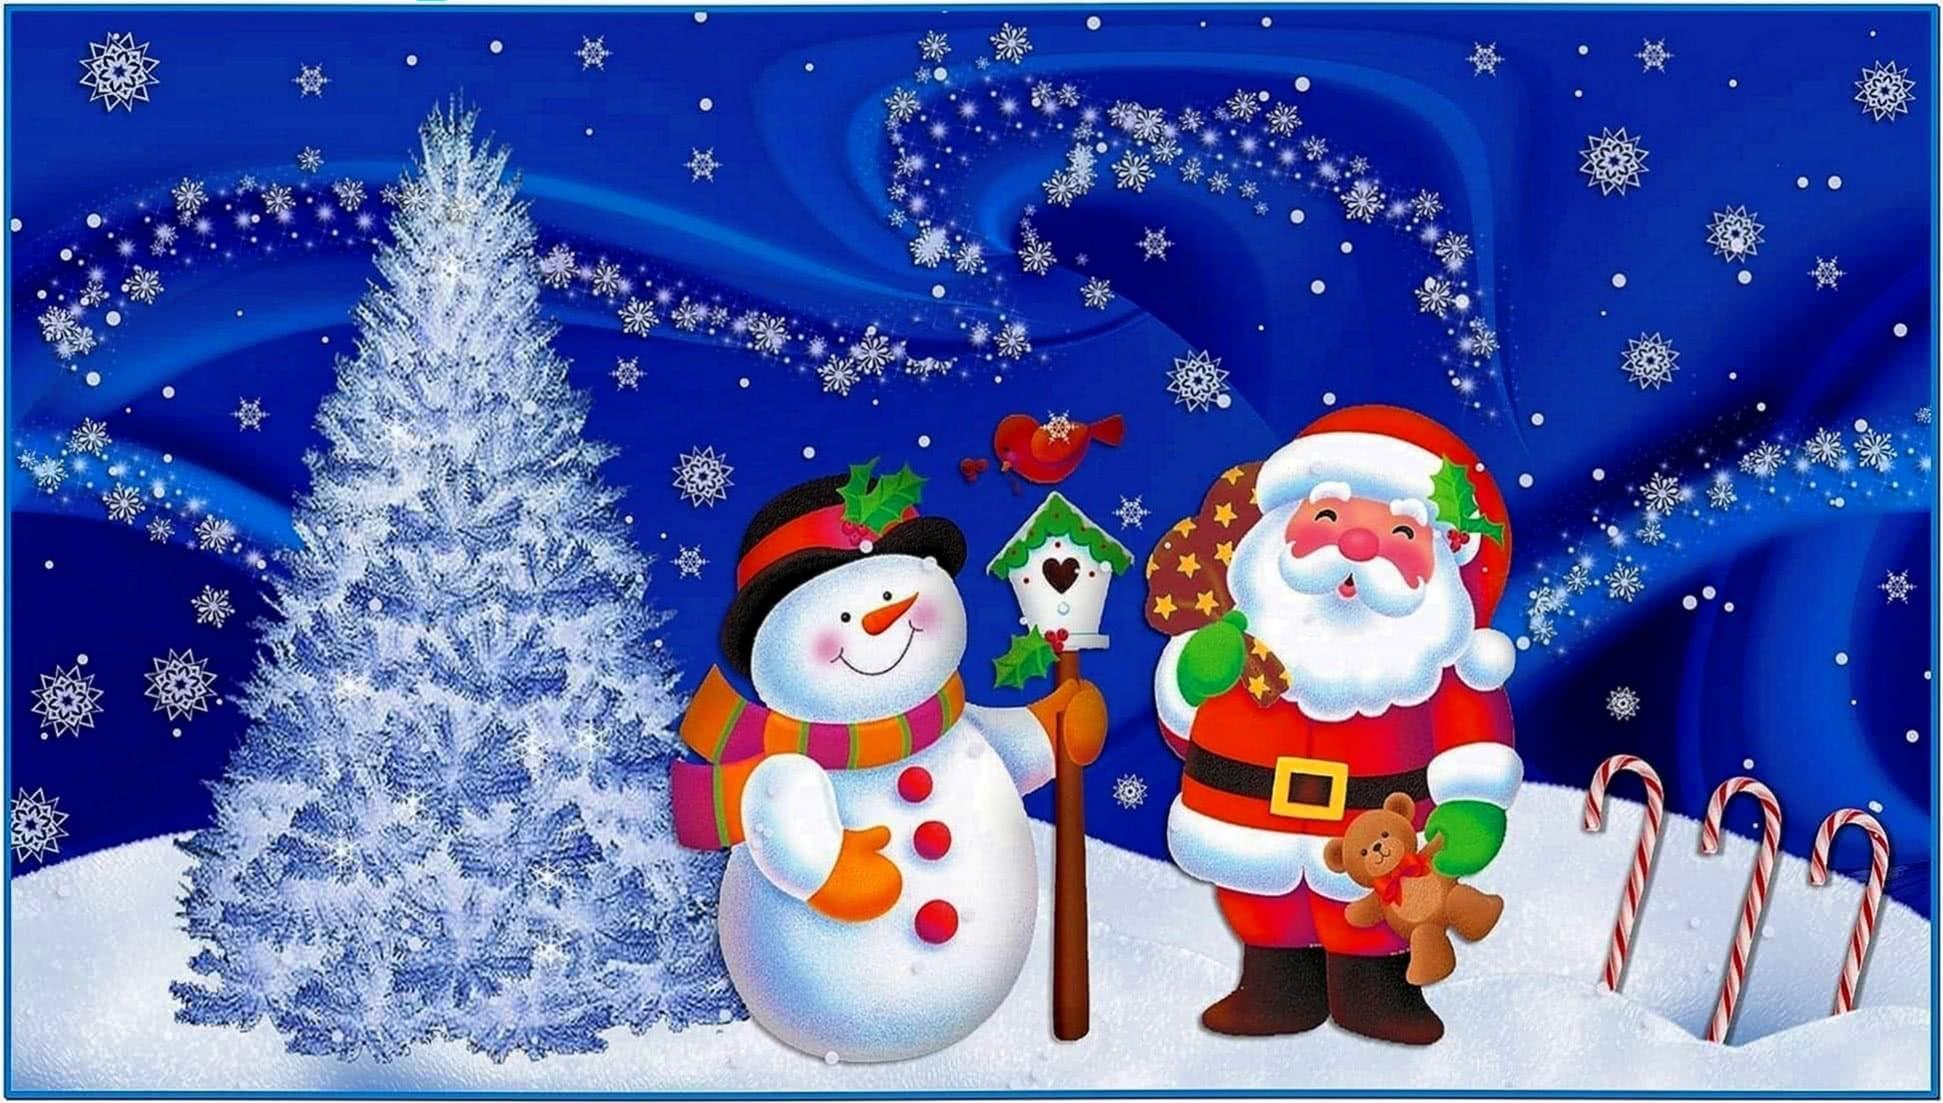 Christmas desktop wallpapers and screensavers